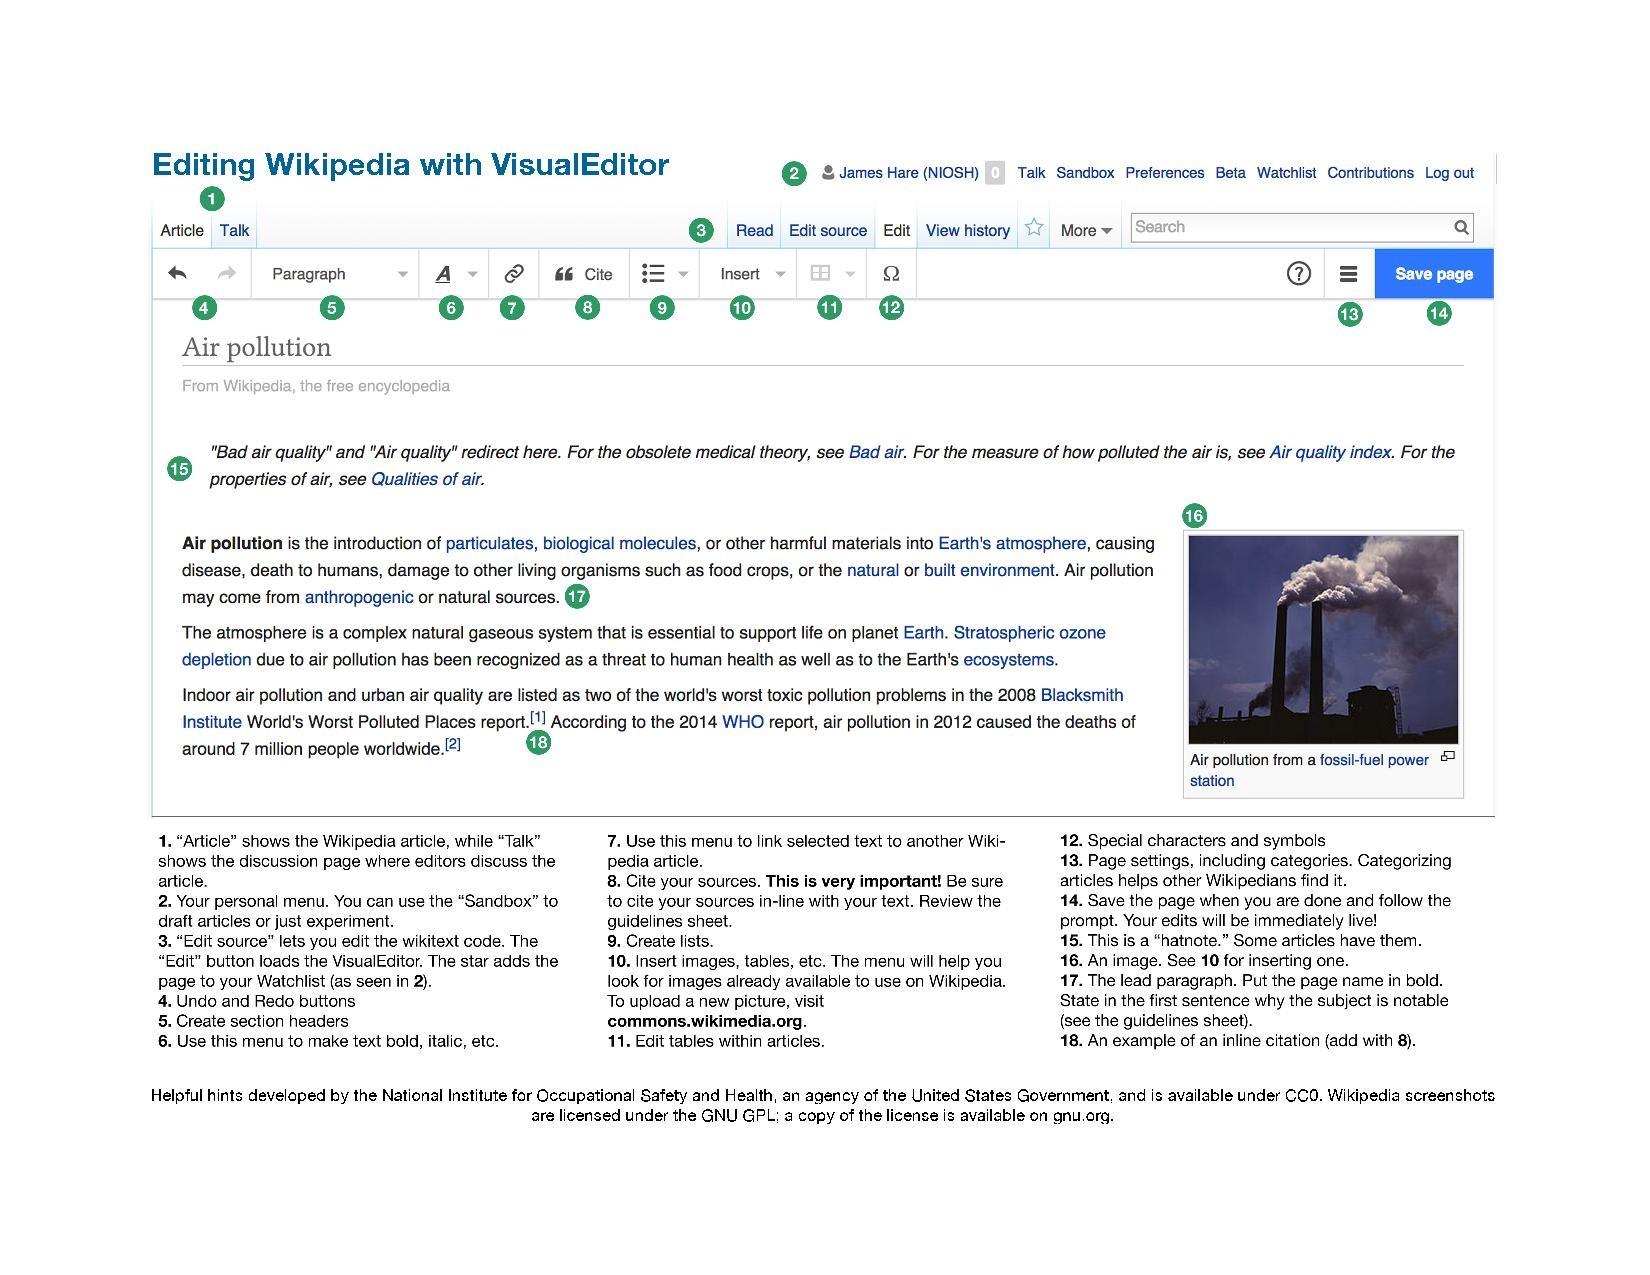 Filewikipedia help sheet editing wikipedia with visualeditor filewikipedia help sheet editing wikipedia with visualeditorpdf buycottarizona